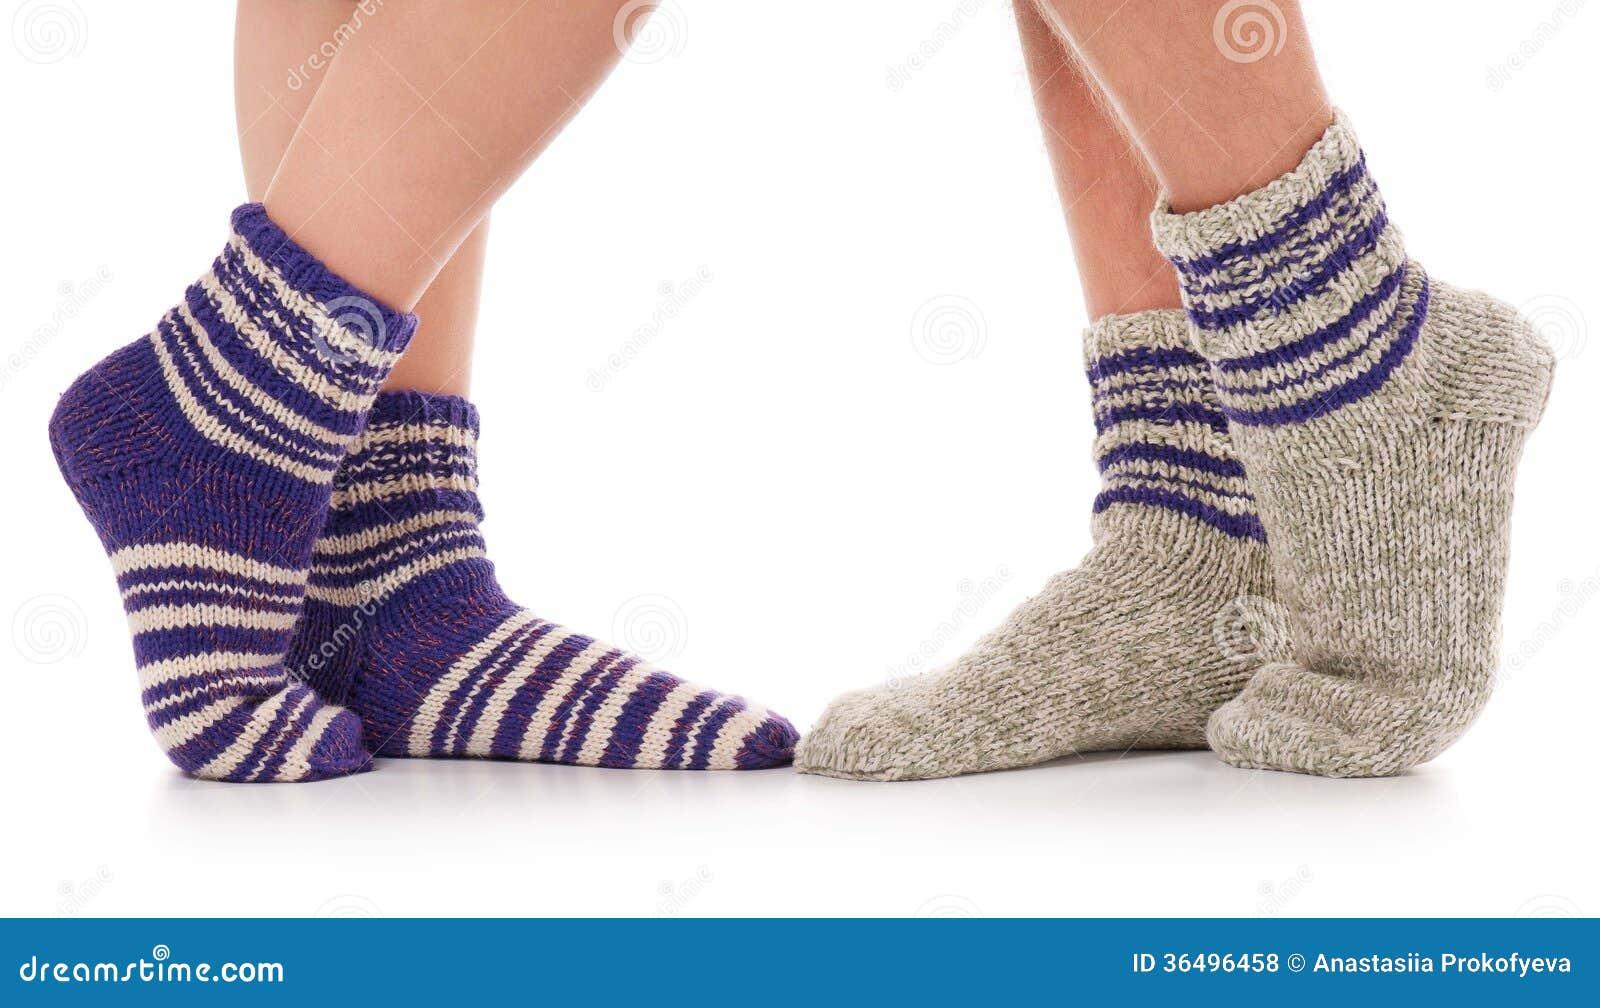 Knitting Pattern For Diabetic Socks : Knitted Socks Royalty Free Stock Photos - Image: 36496458